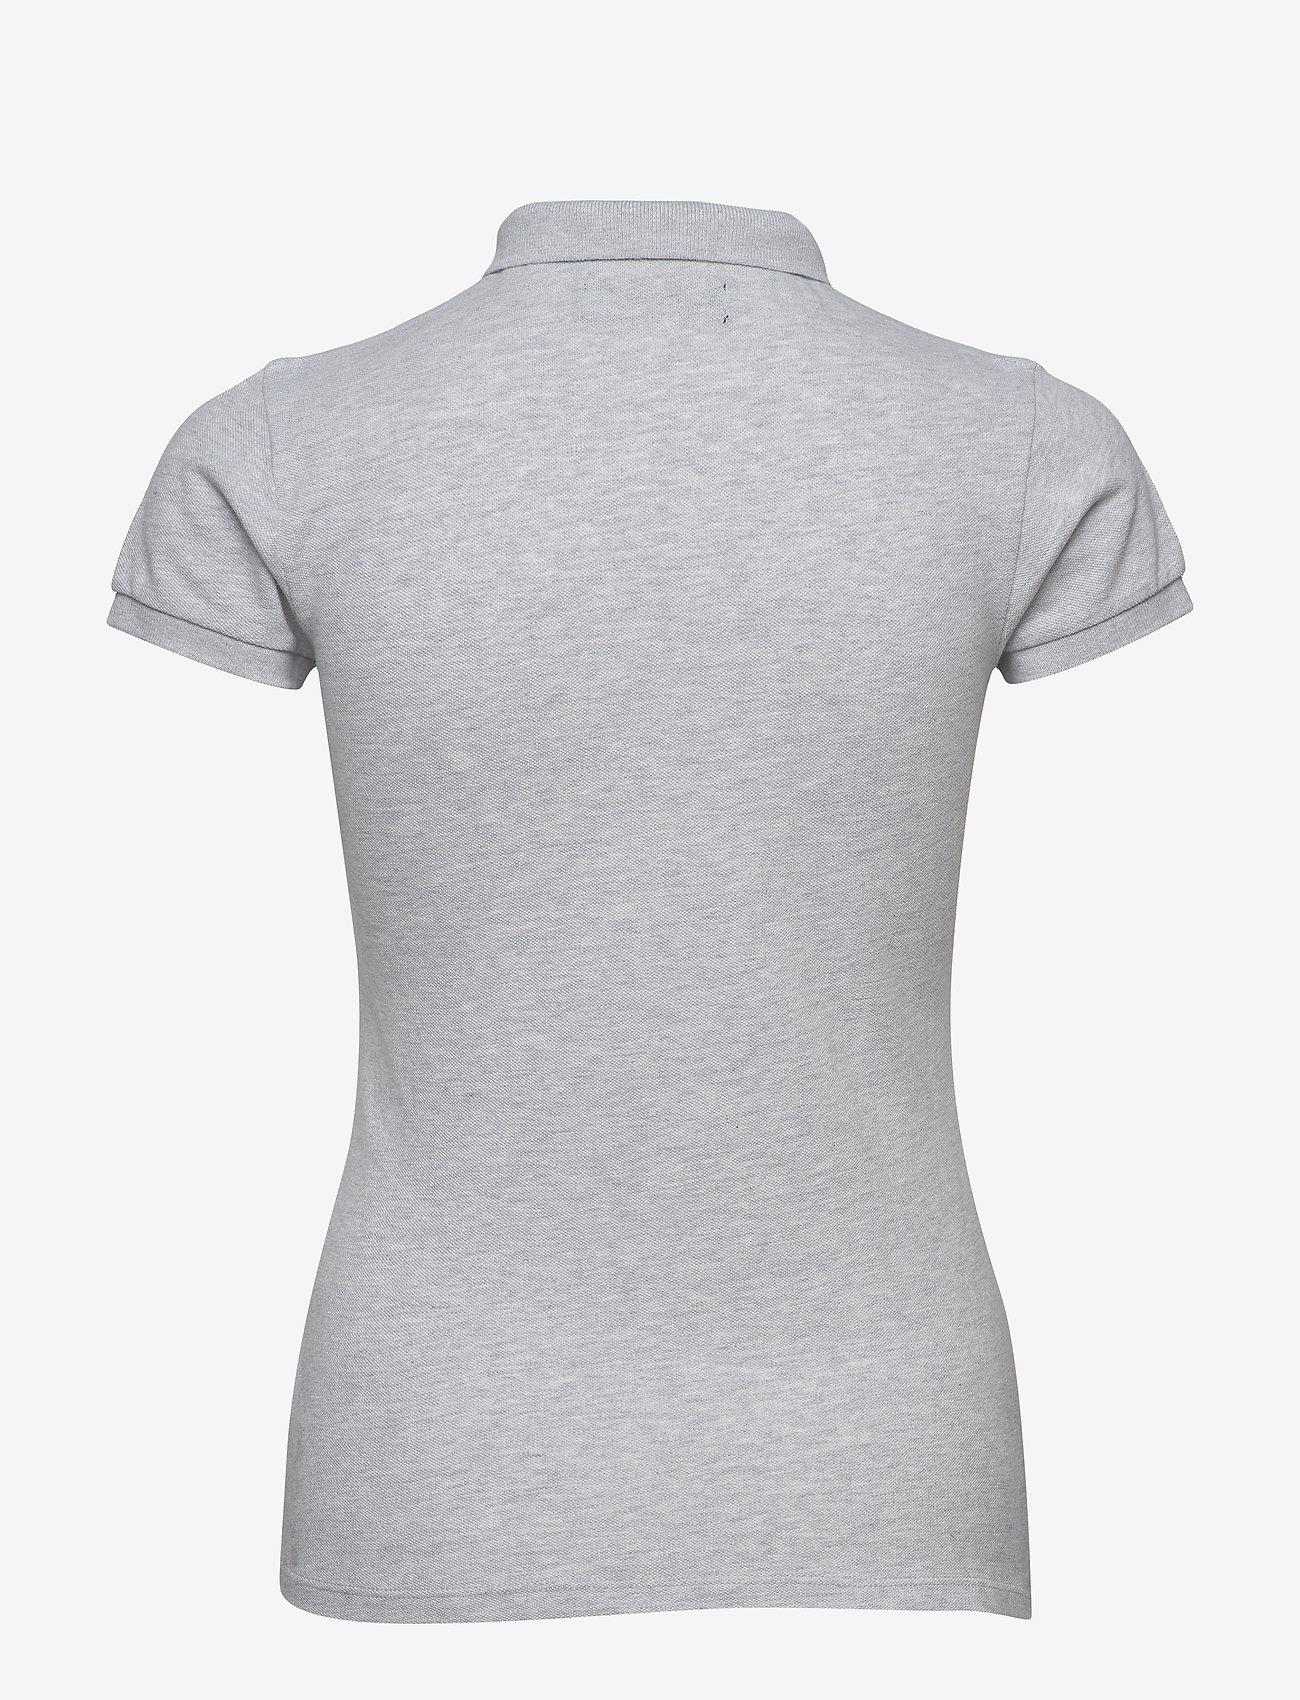 Polo Shirt (Grey Marl) (20 €) - Superdry qiCtx